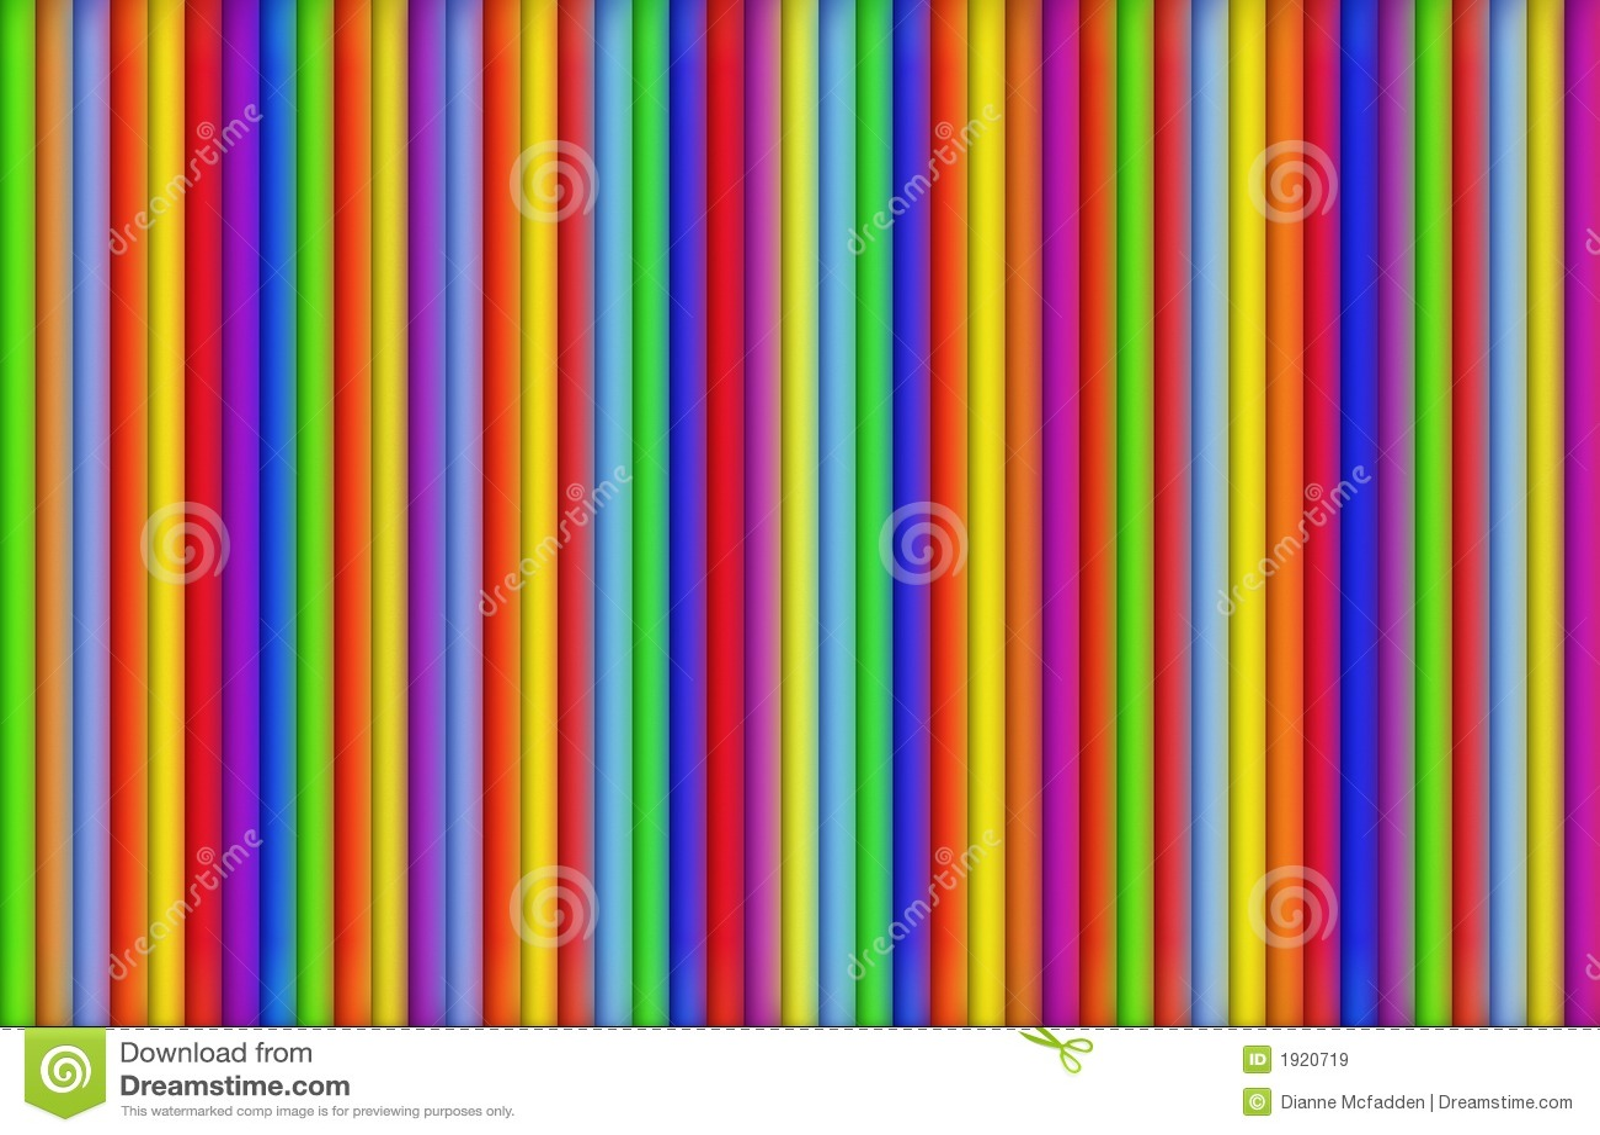 Kolorowe pasy